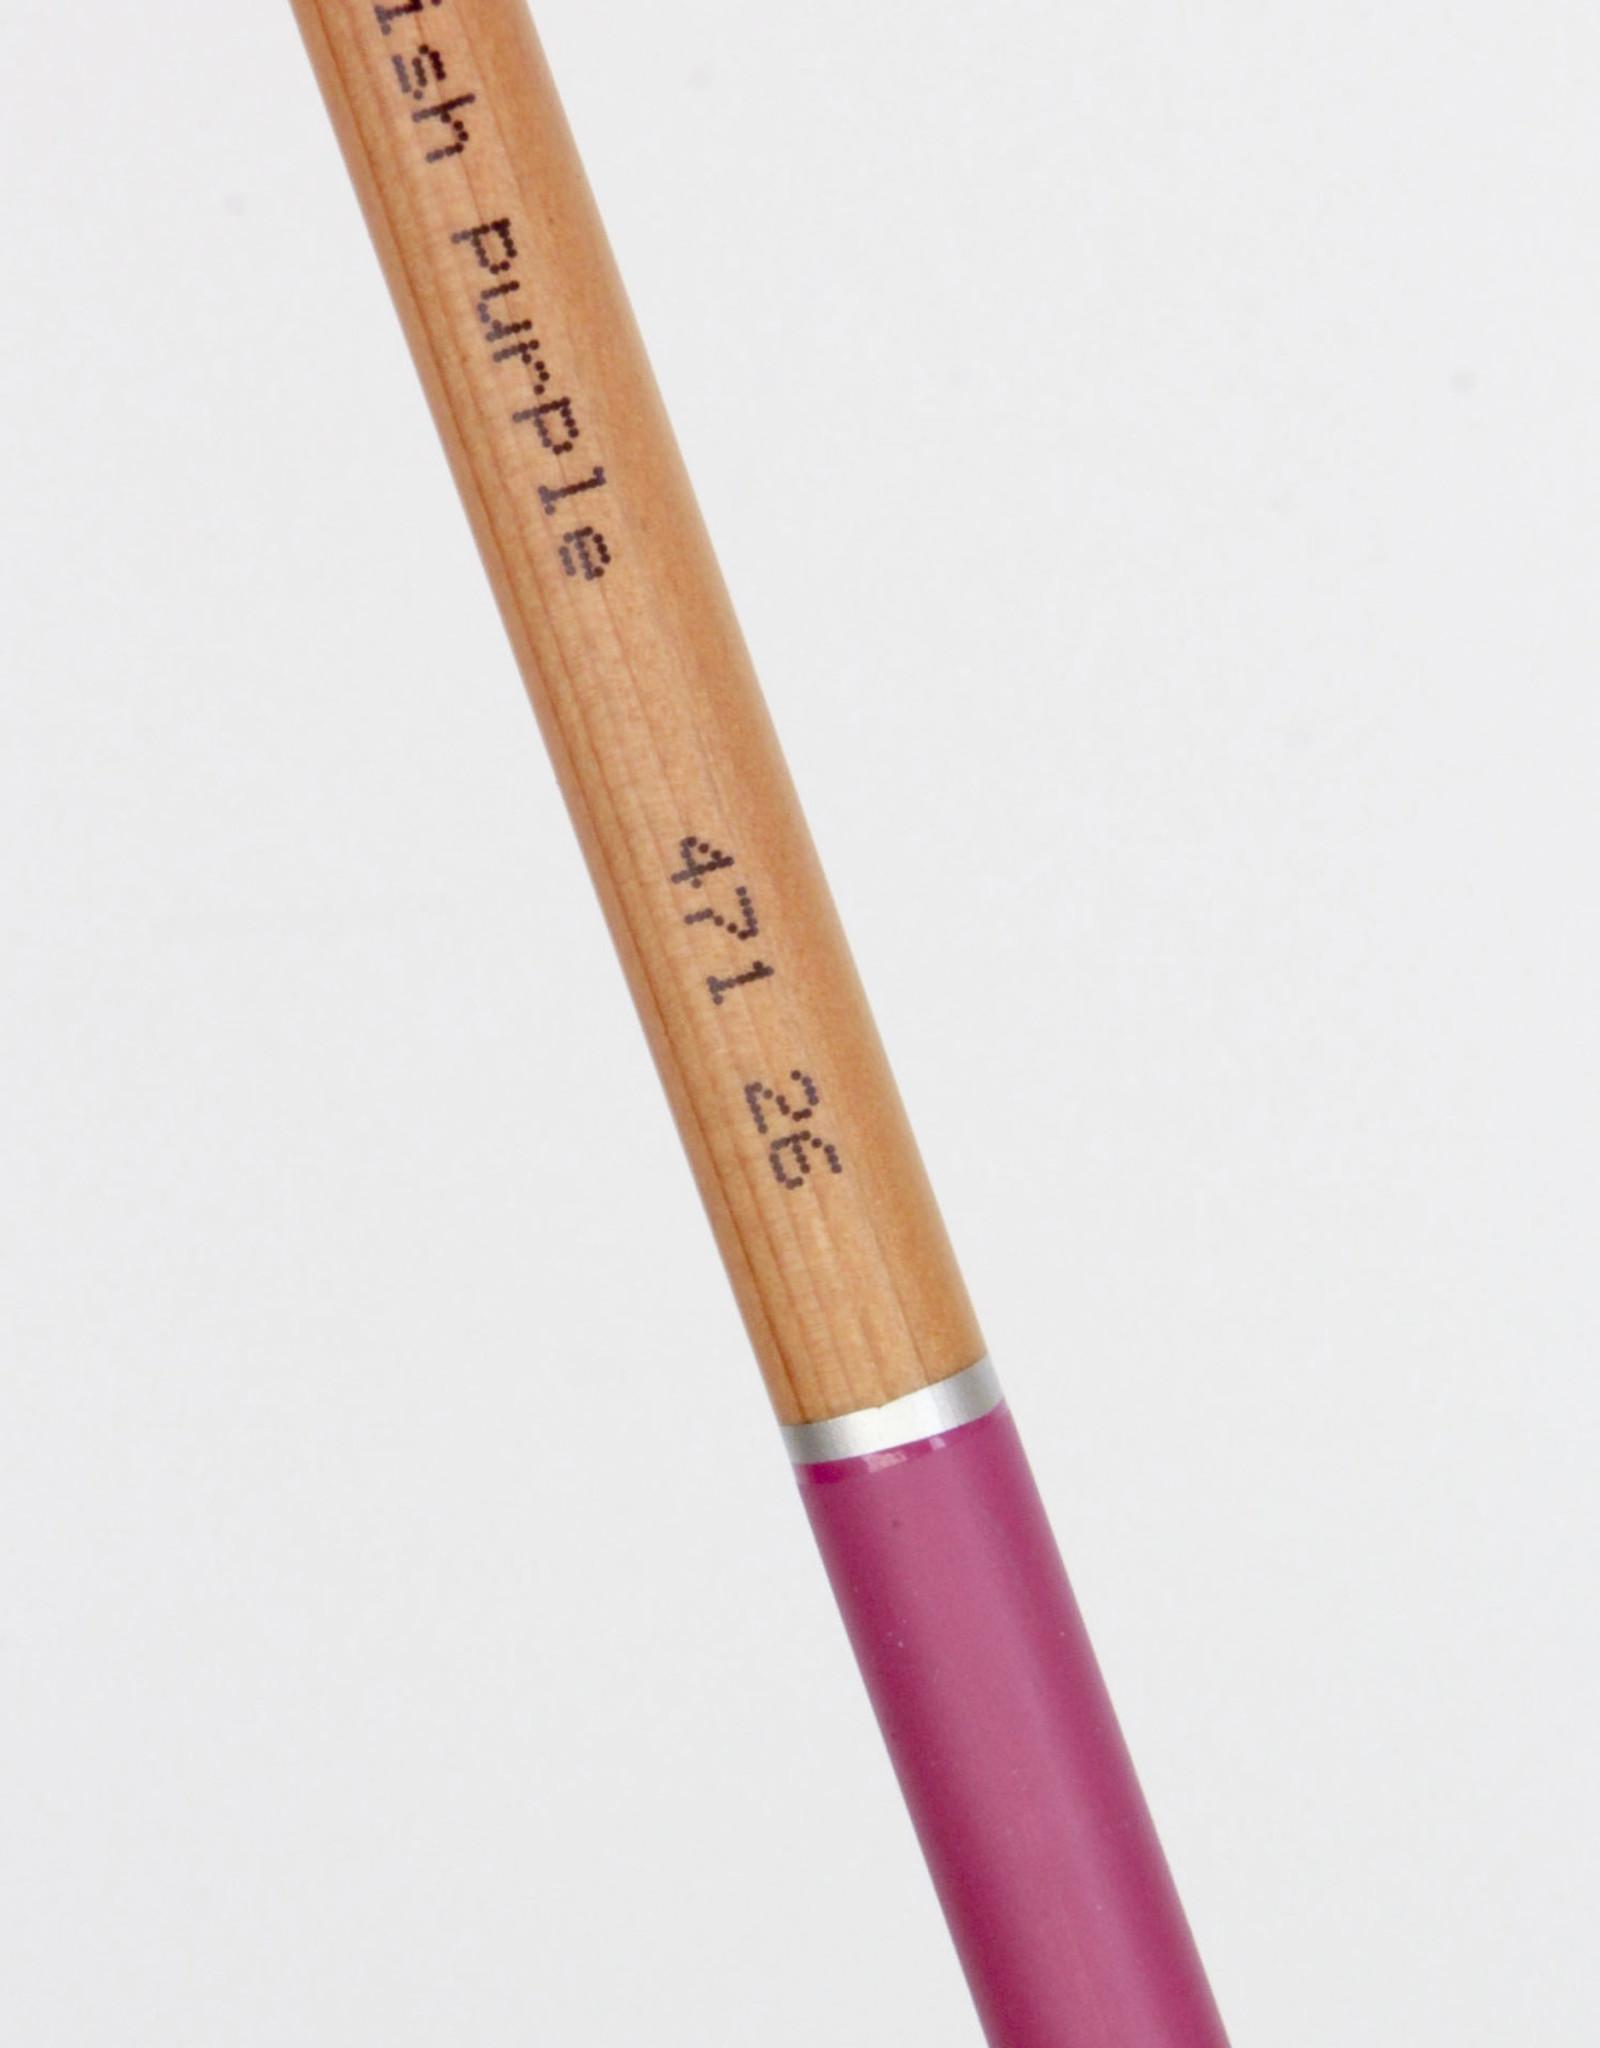 Cretacolor, Fine Art Pastel Pencil, Reddish Purple